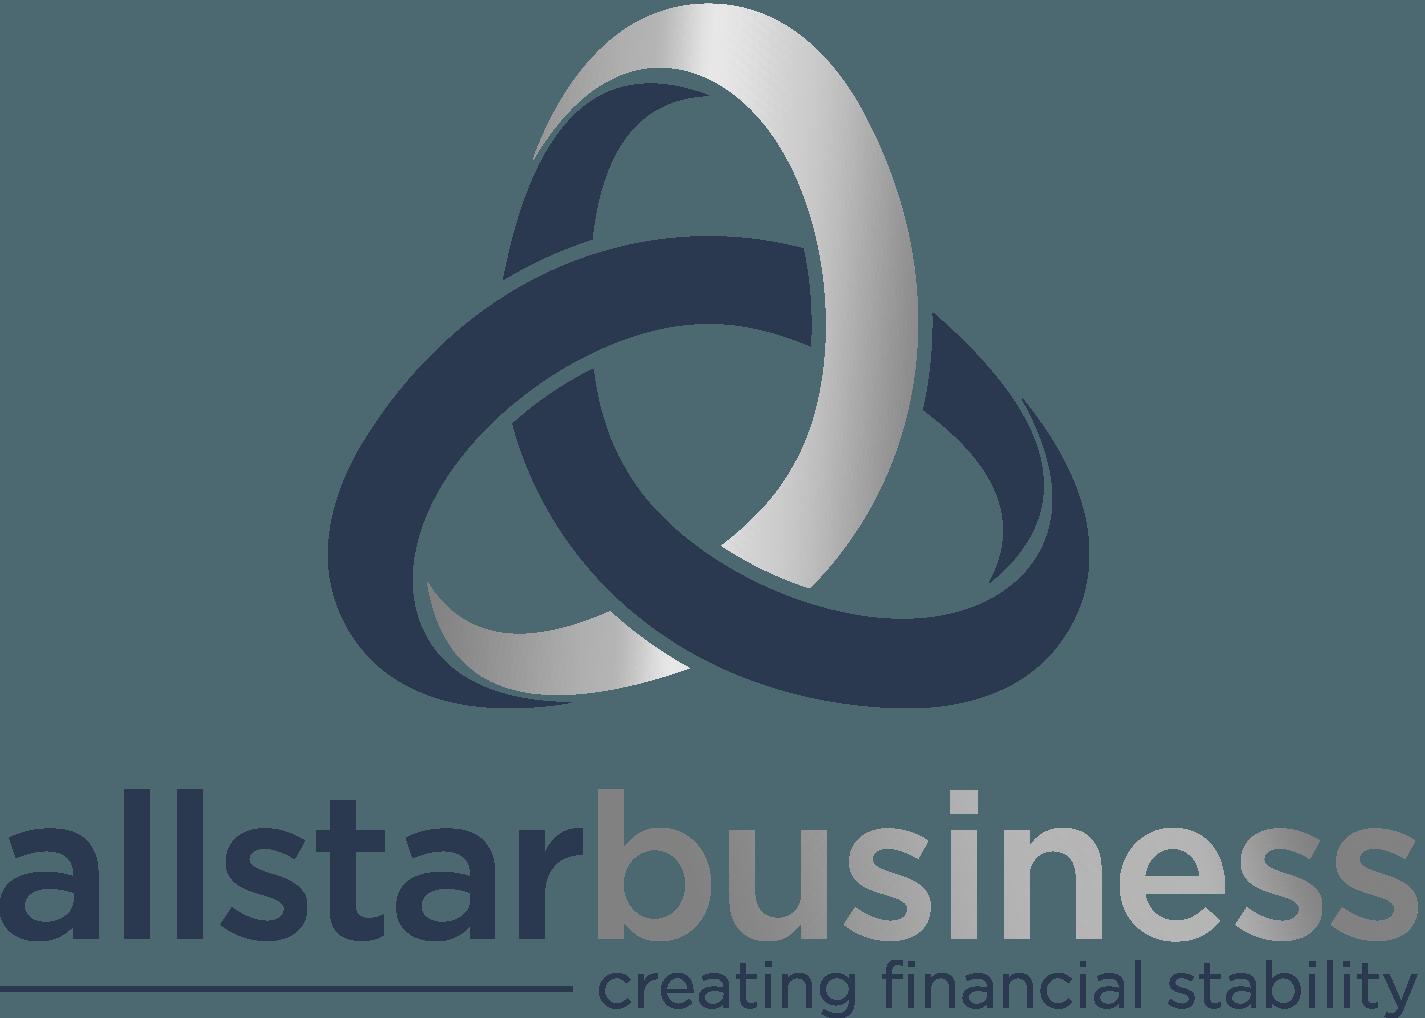 Finance clipart financial stability. Need a loan looking